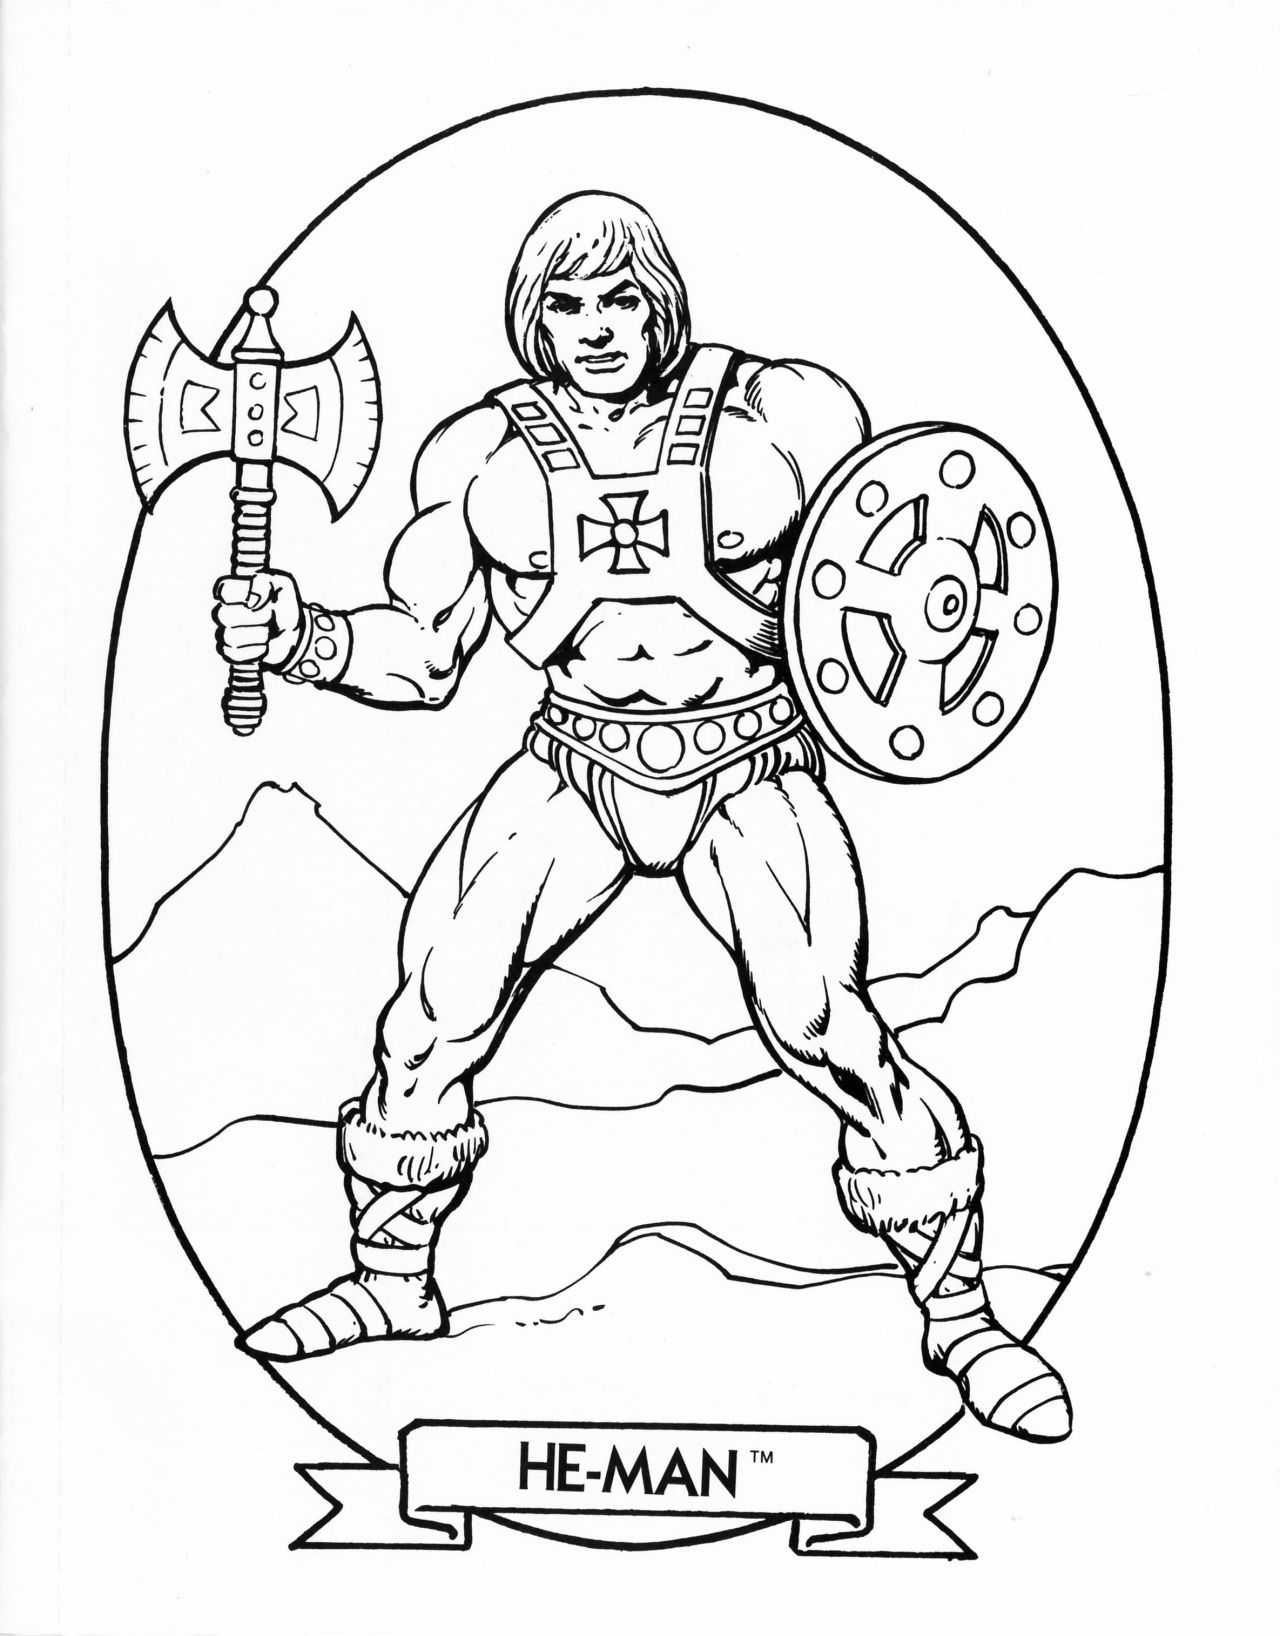 The Savage Powers Of Grayskull In 2020 Cartoon Coloring Pages Free Coloring Pages Super Coloring Pages